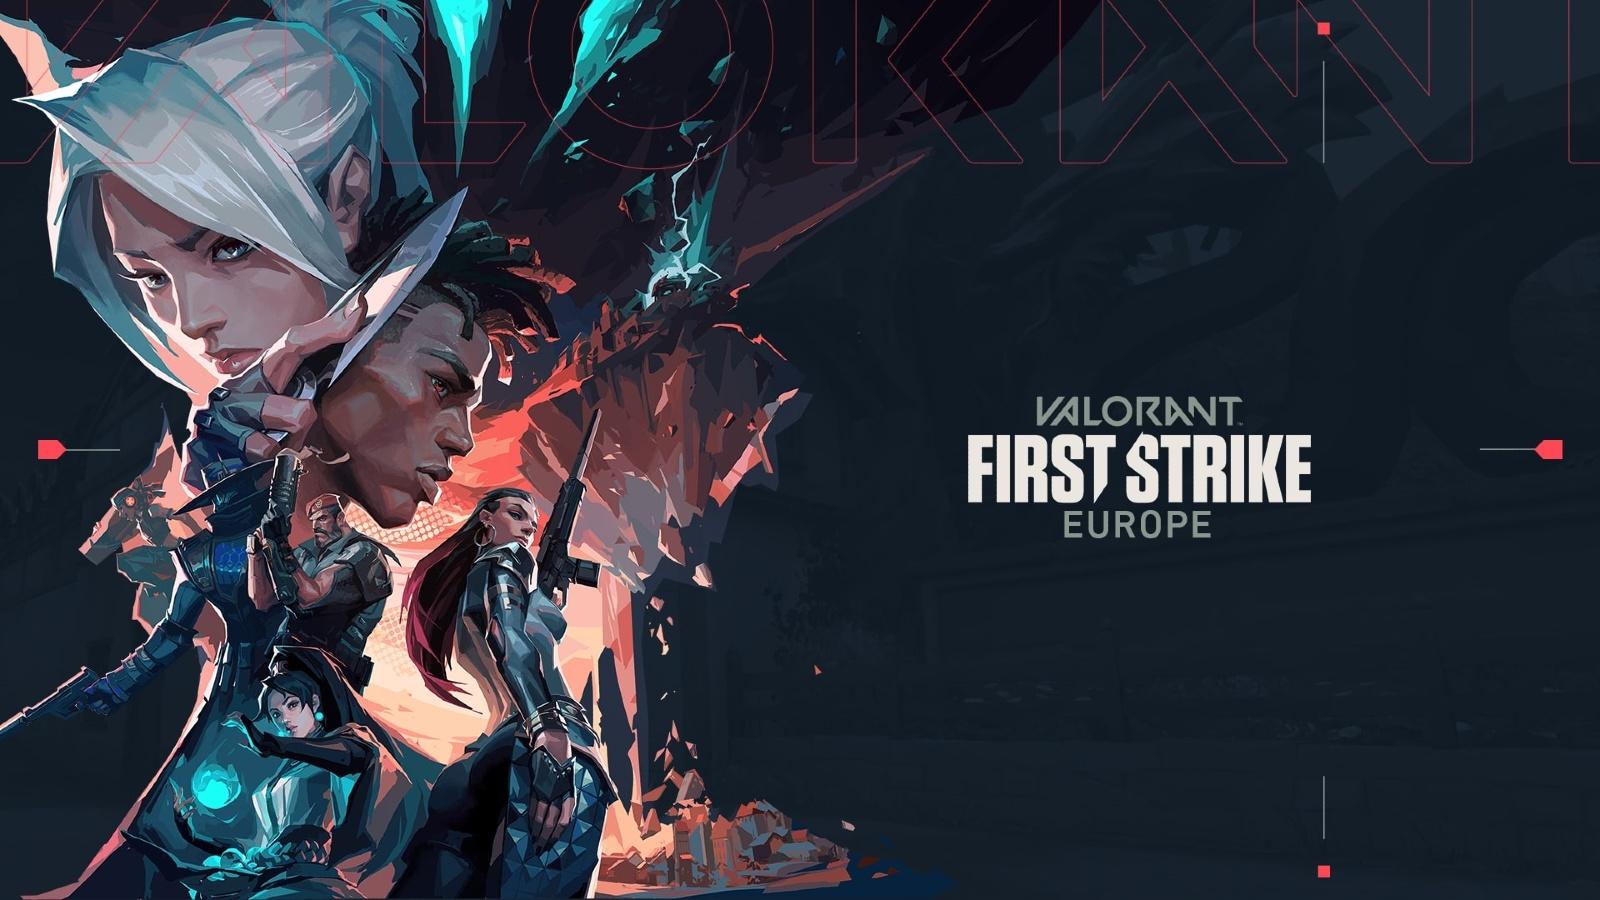 Valorant first strike europe